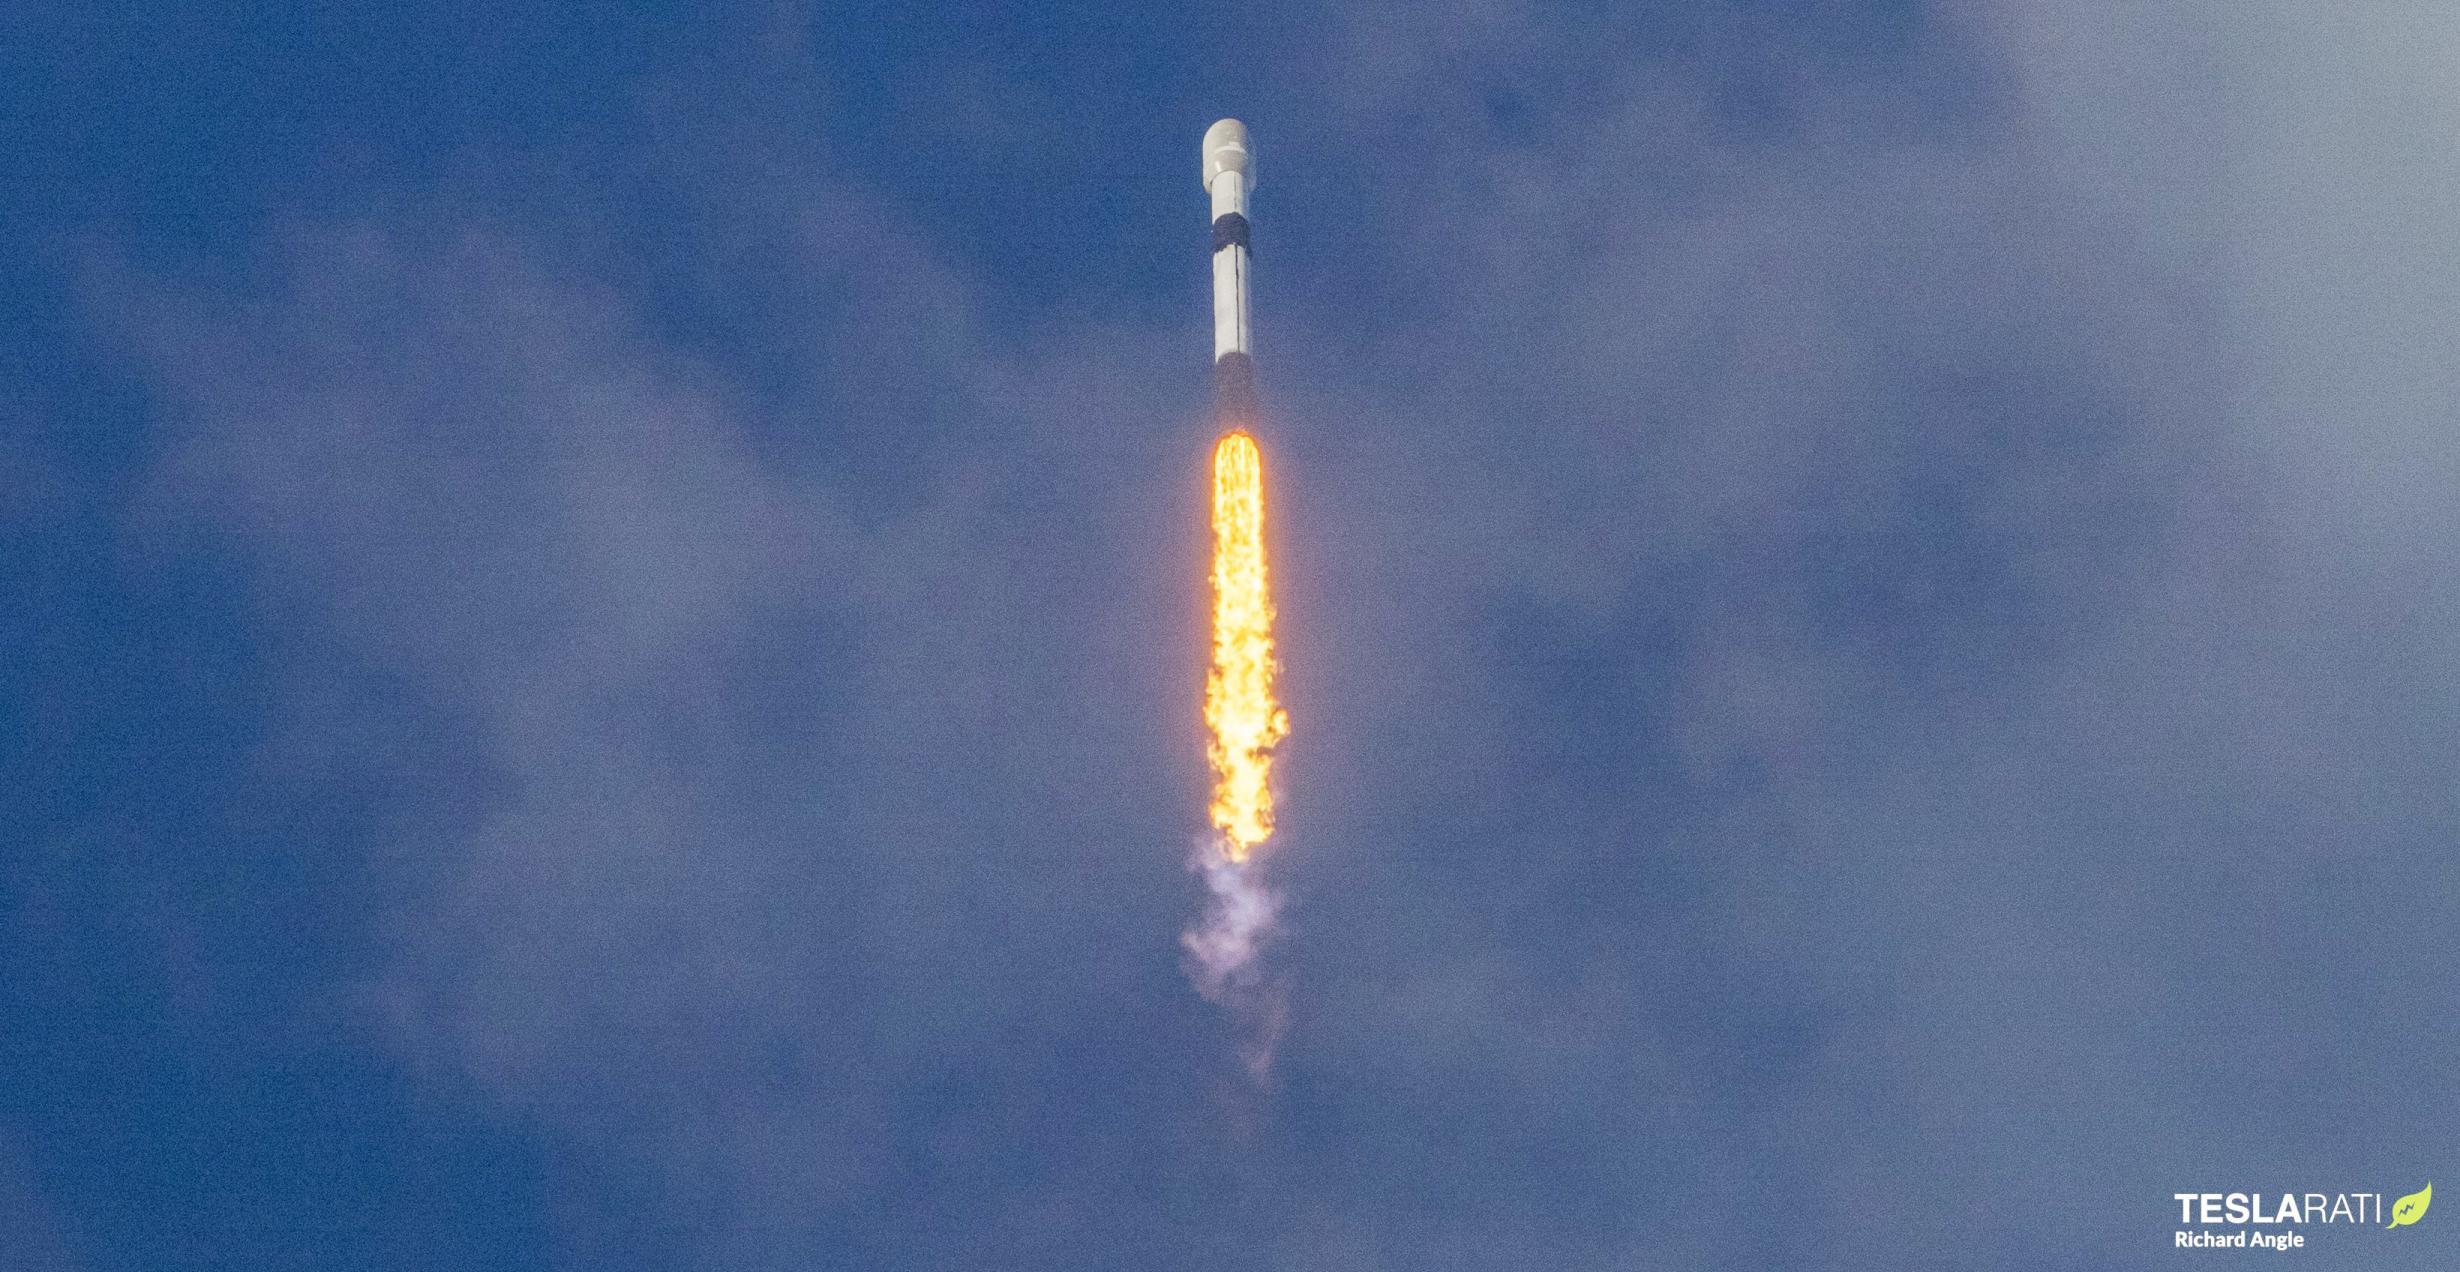 Starlink-26 Falcon 9 B1058 39A 051521 (Richard Angle) 2 edit (c)